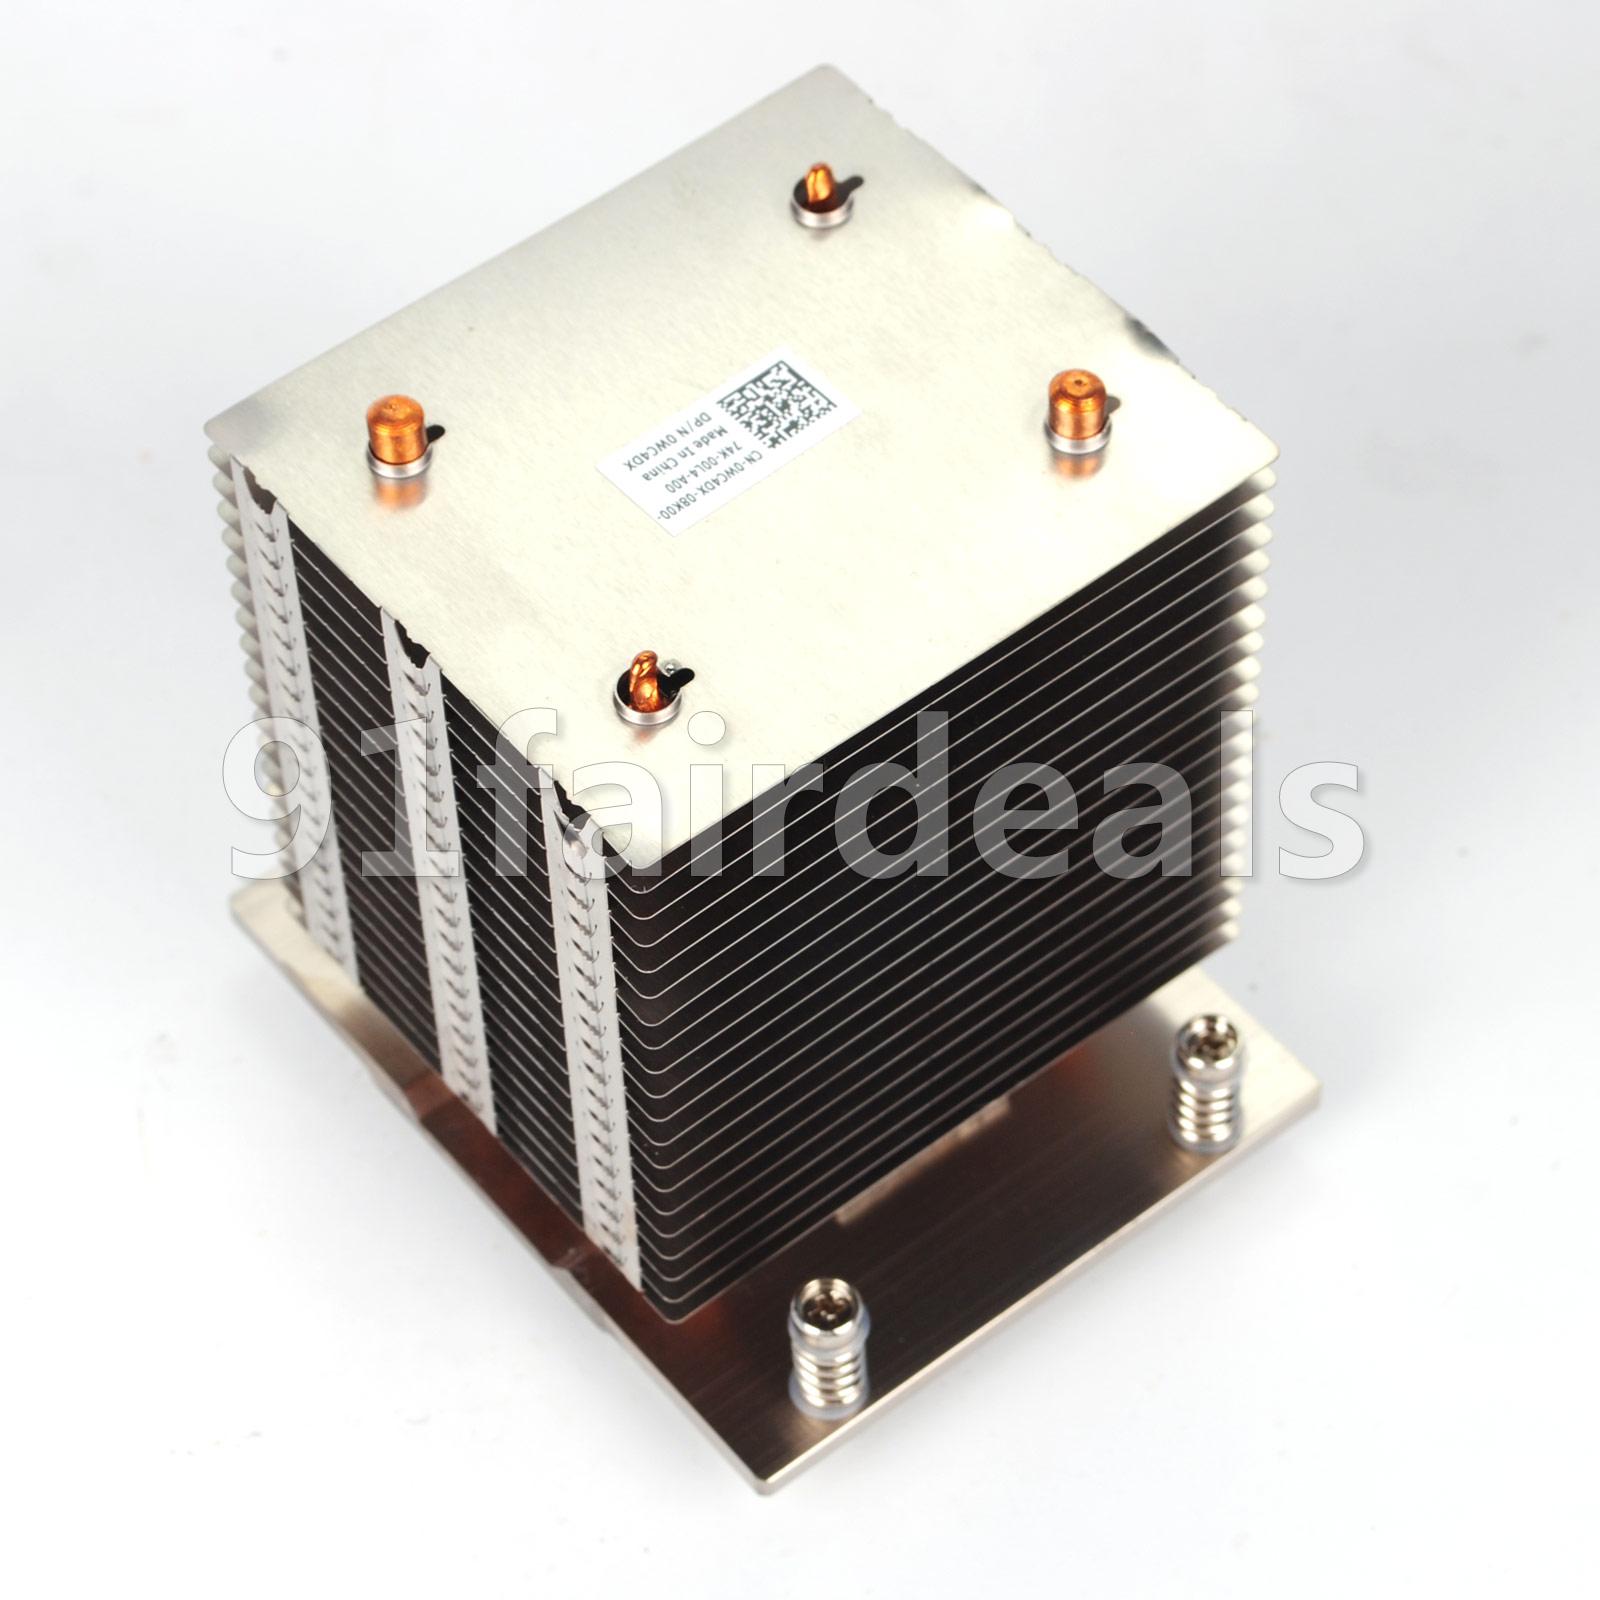 CPU PROCESSOR HEATSINK DELL POWEREDGE TOWER SERVER T630 WC4DX